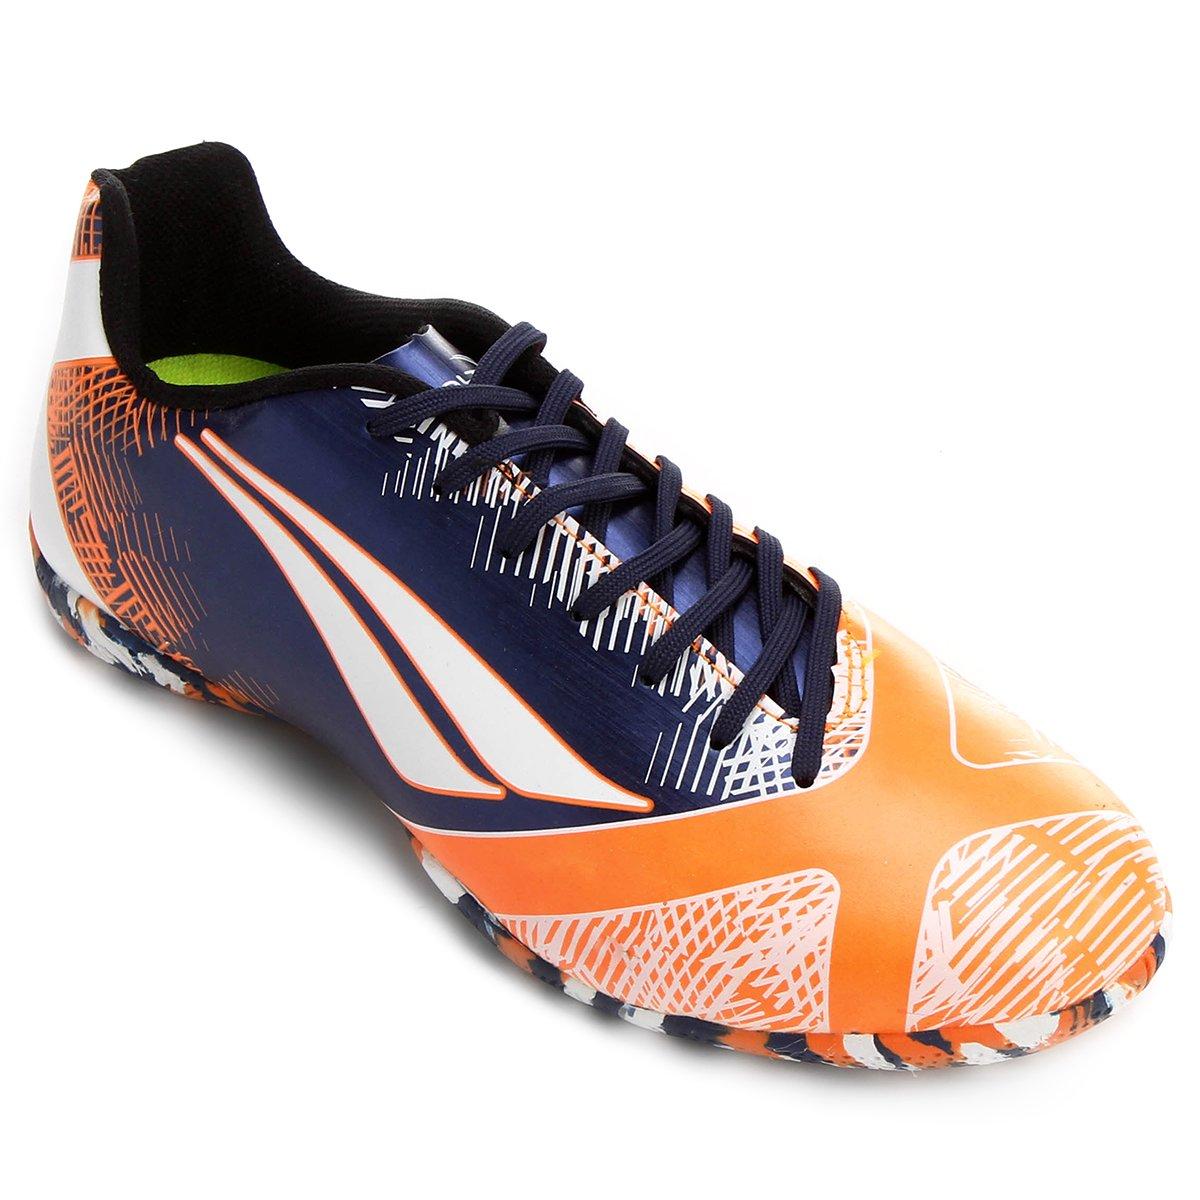 a745f8efc7503 Chuteira Futsal Penalty Victoria RX 2 VI - Compre Agora